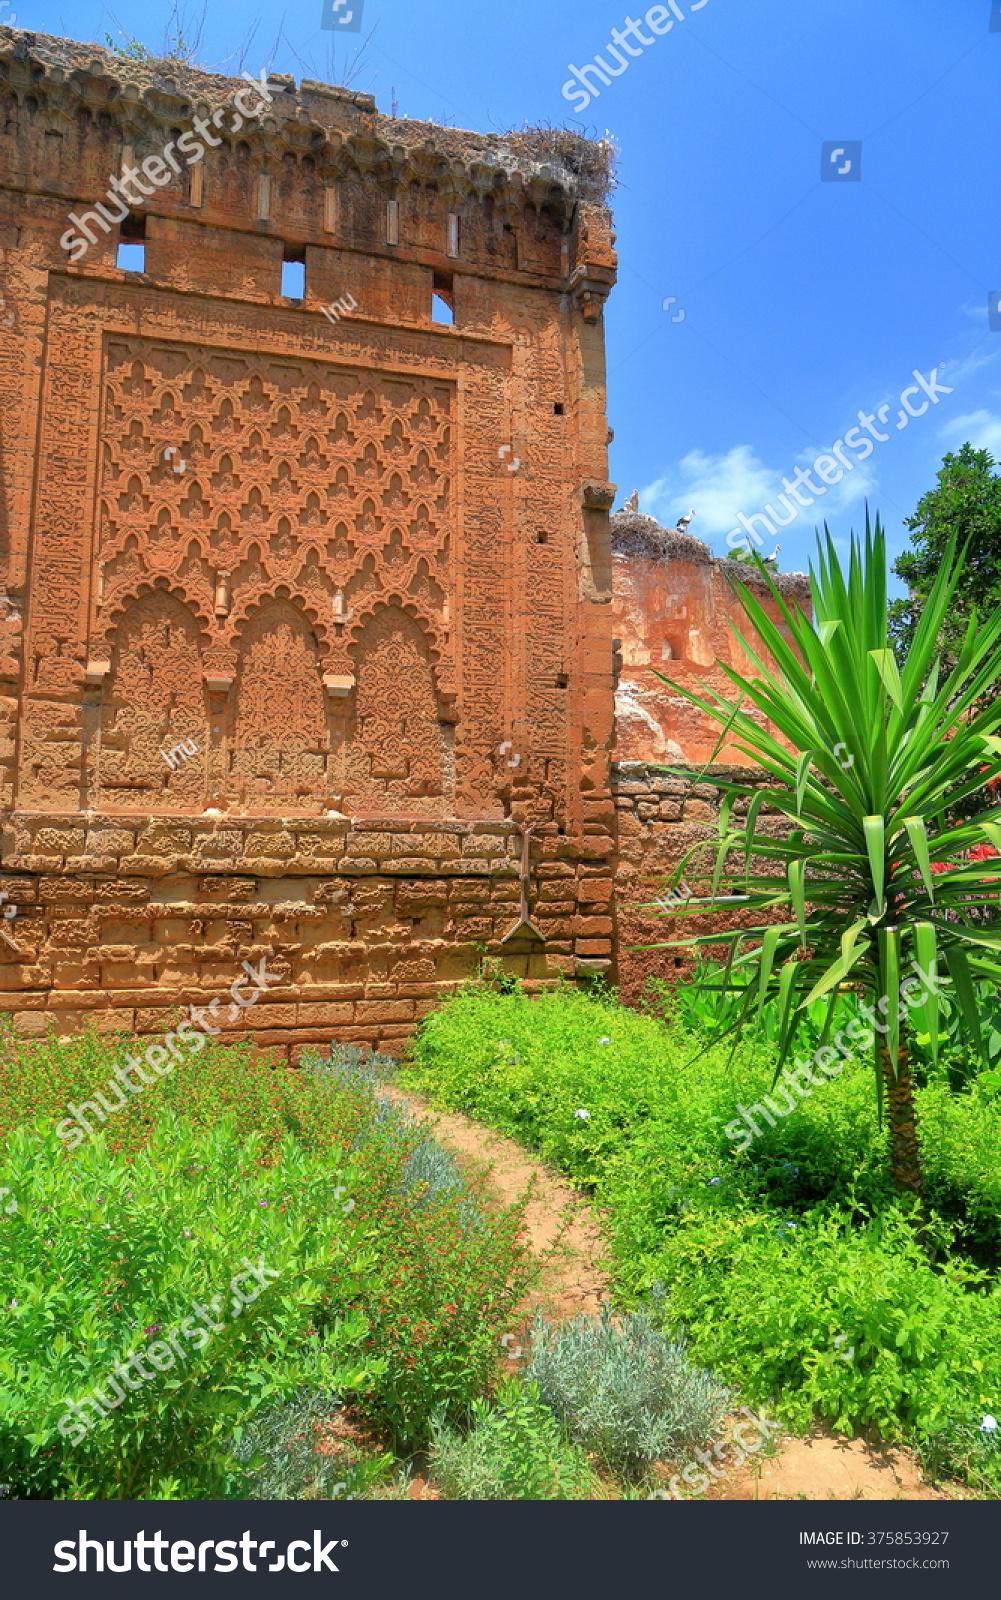 Green Garden Berber Decorations On Building Stock Photo (Edit Now ...